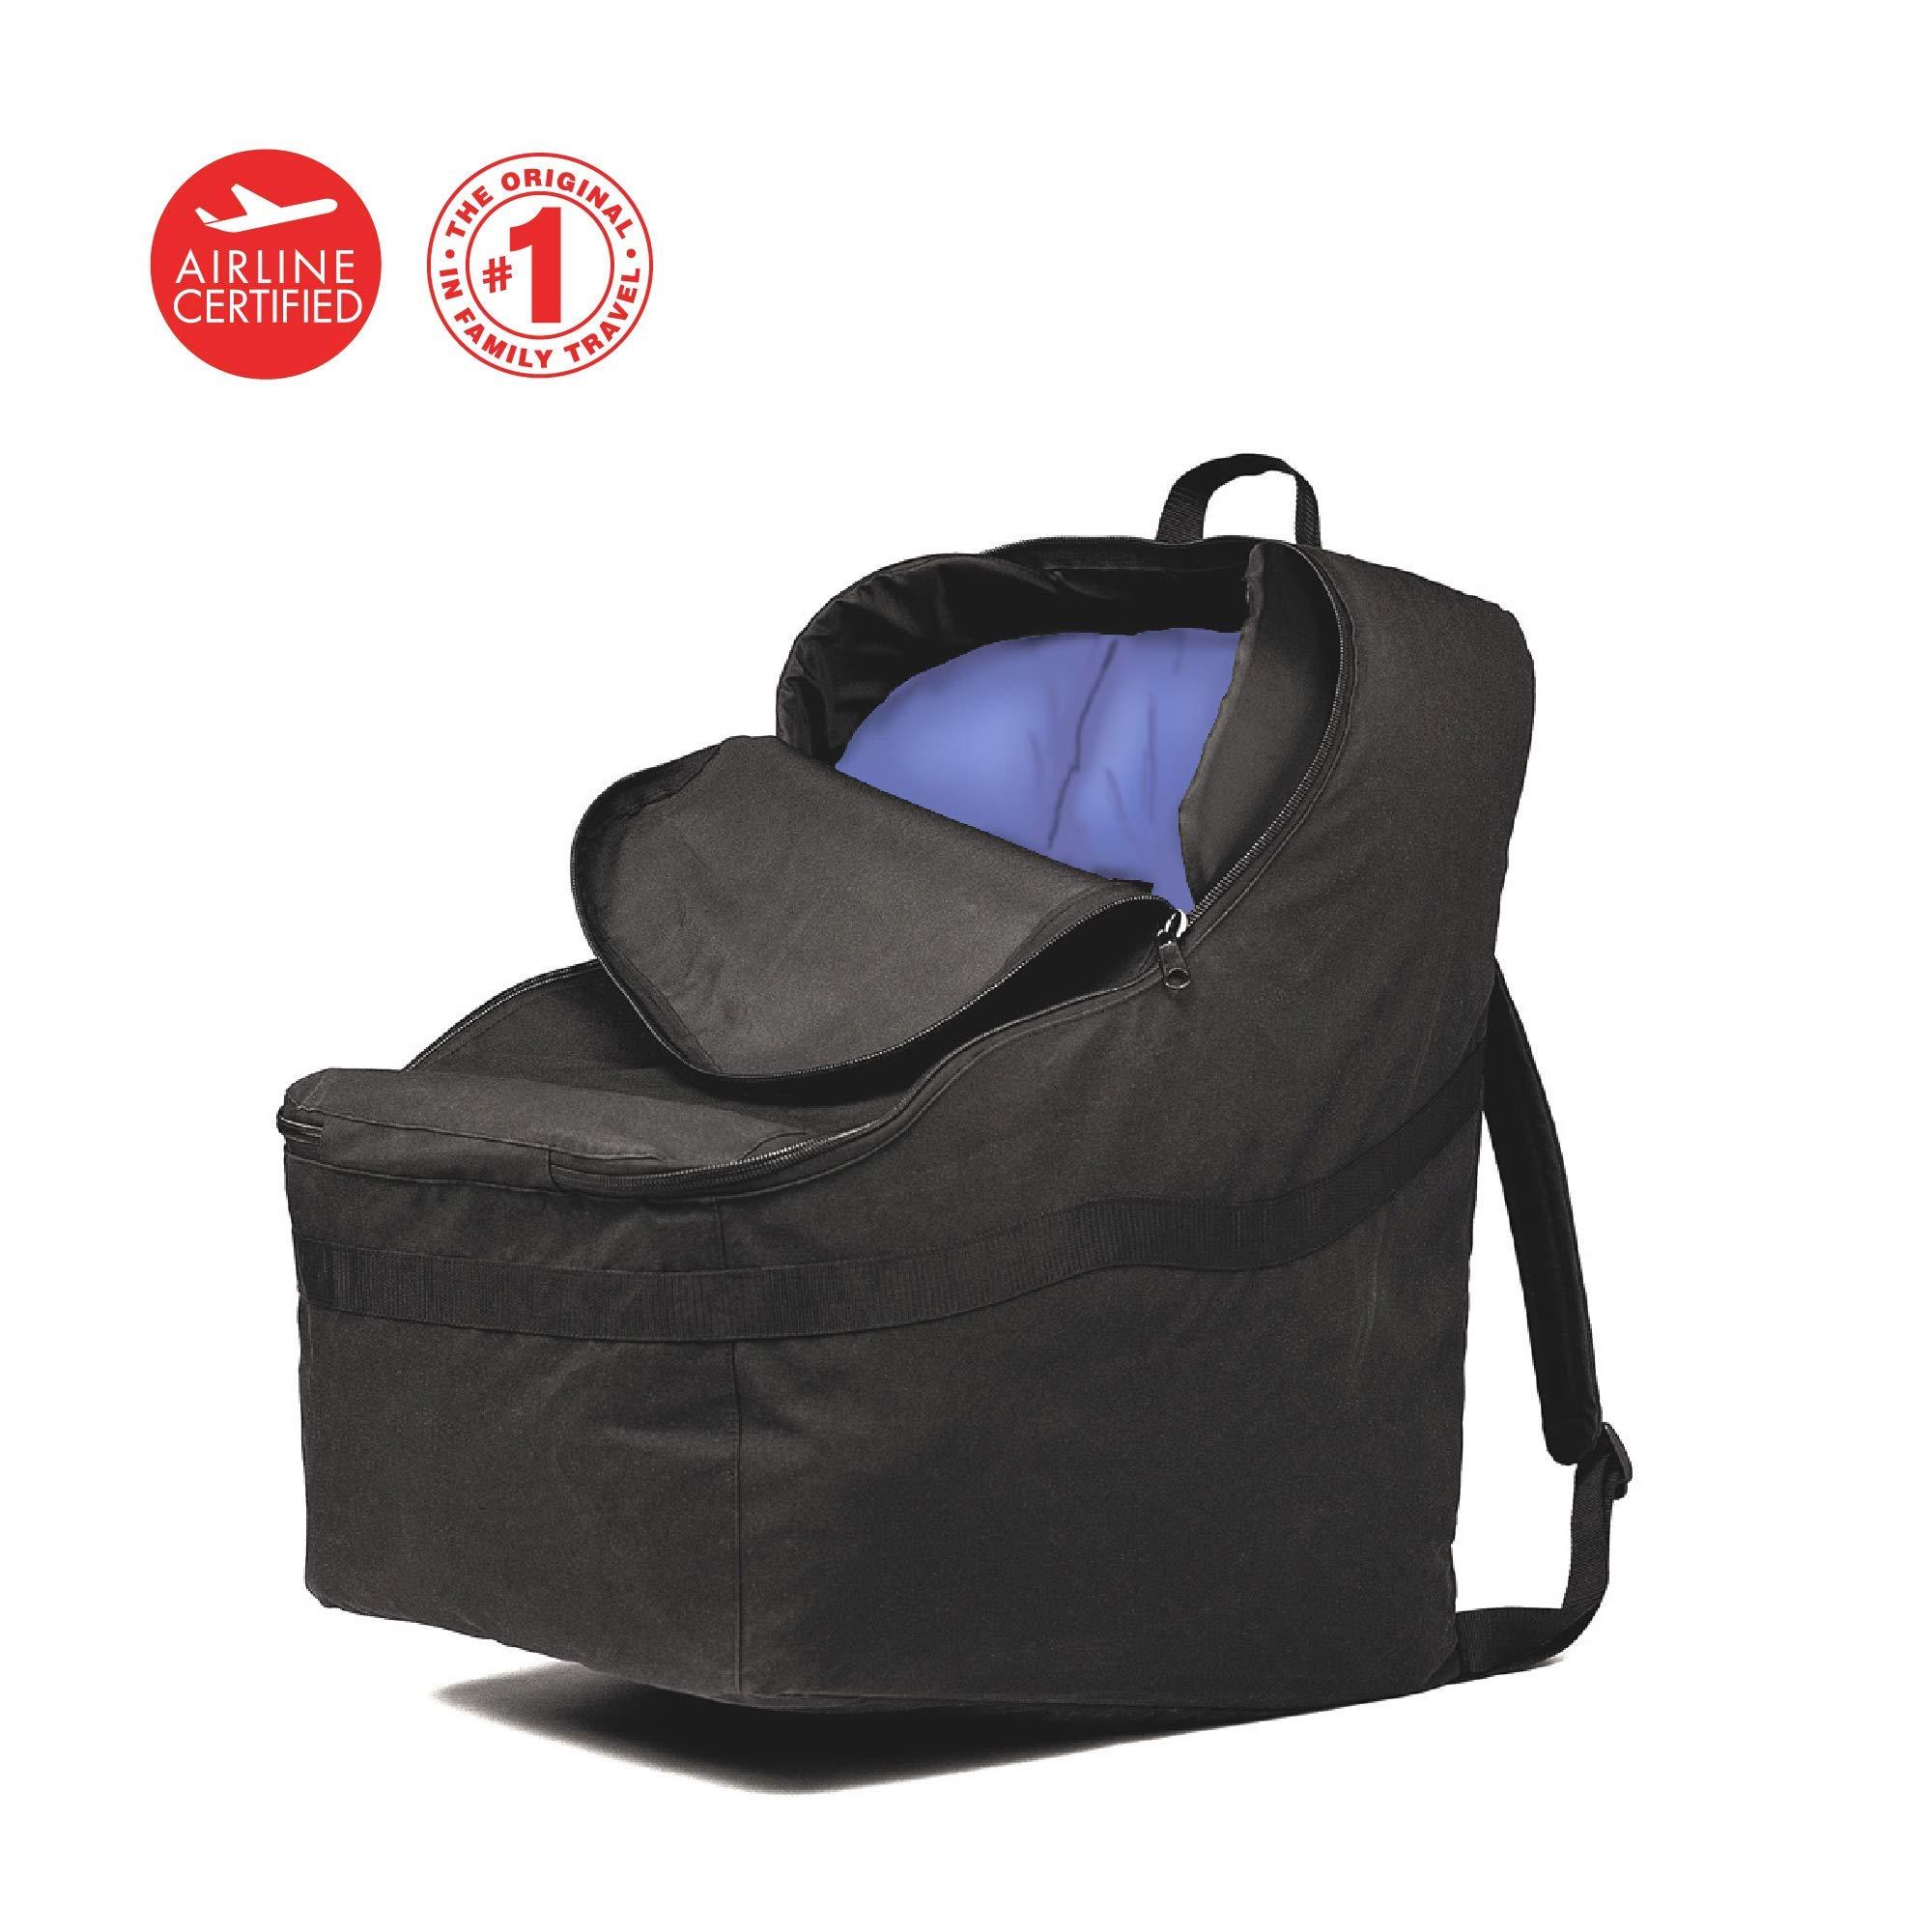 J.L. Childress Ultimate Backpack Padded Car Seat Travel Bag, Black by J.L. Childress